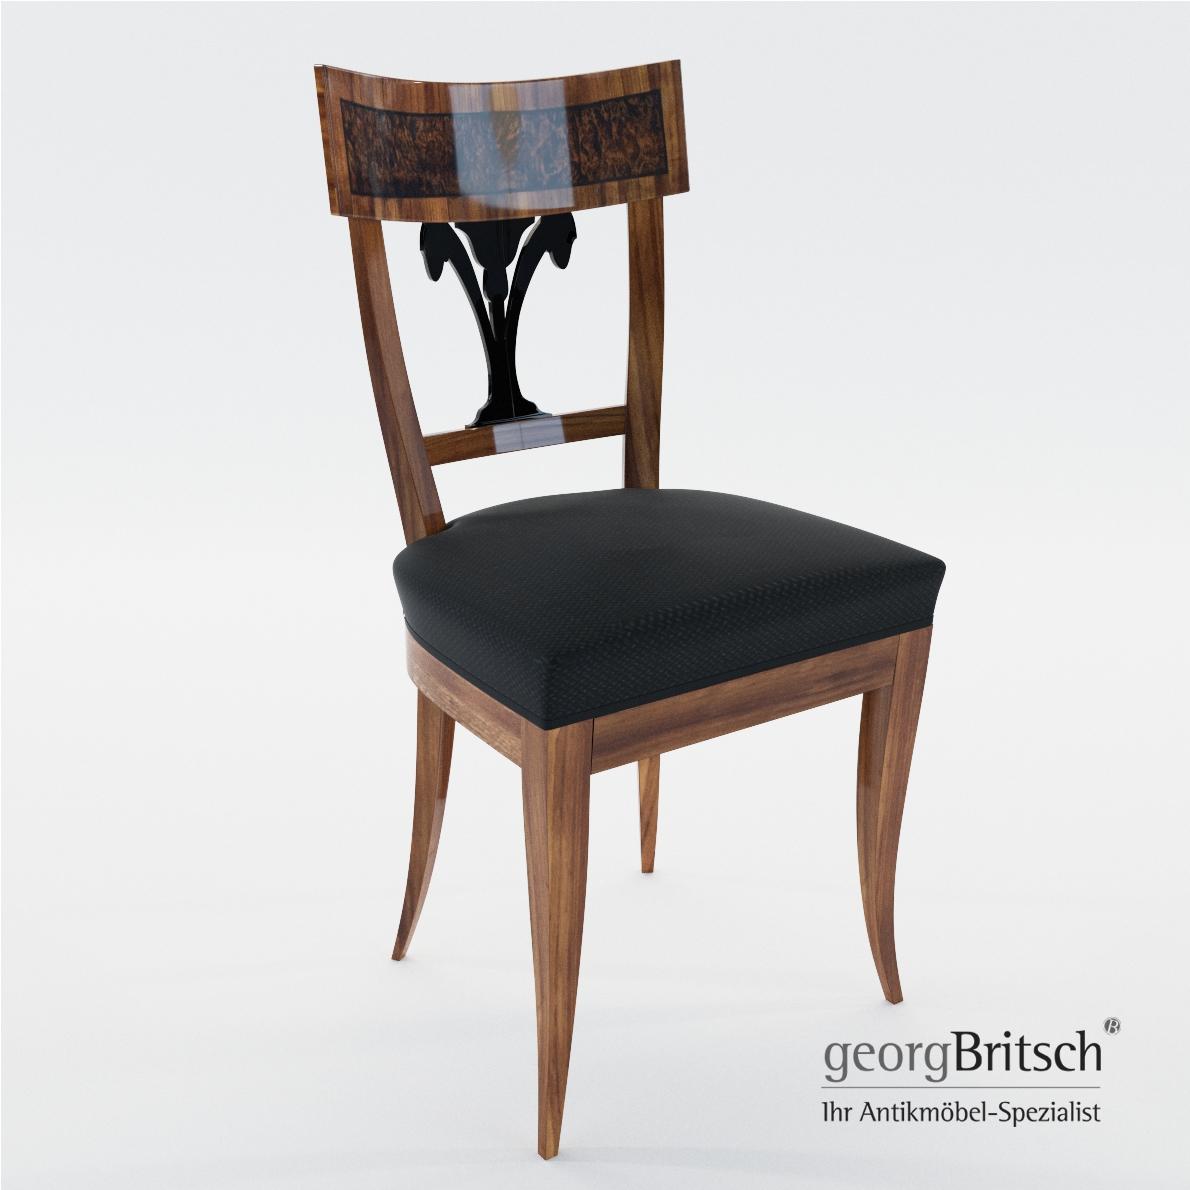 Biedermeier Chair With Black Lacker Ornament Georg